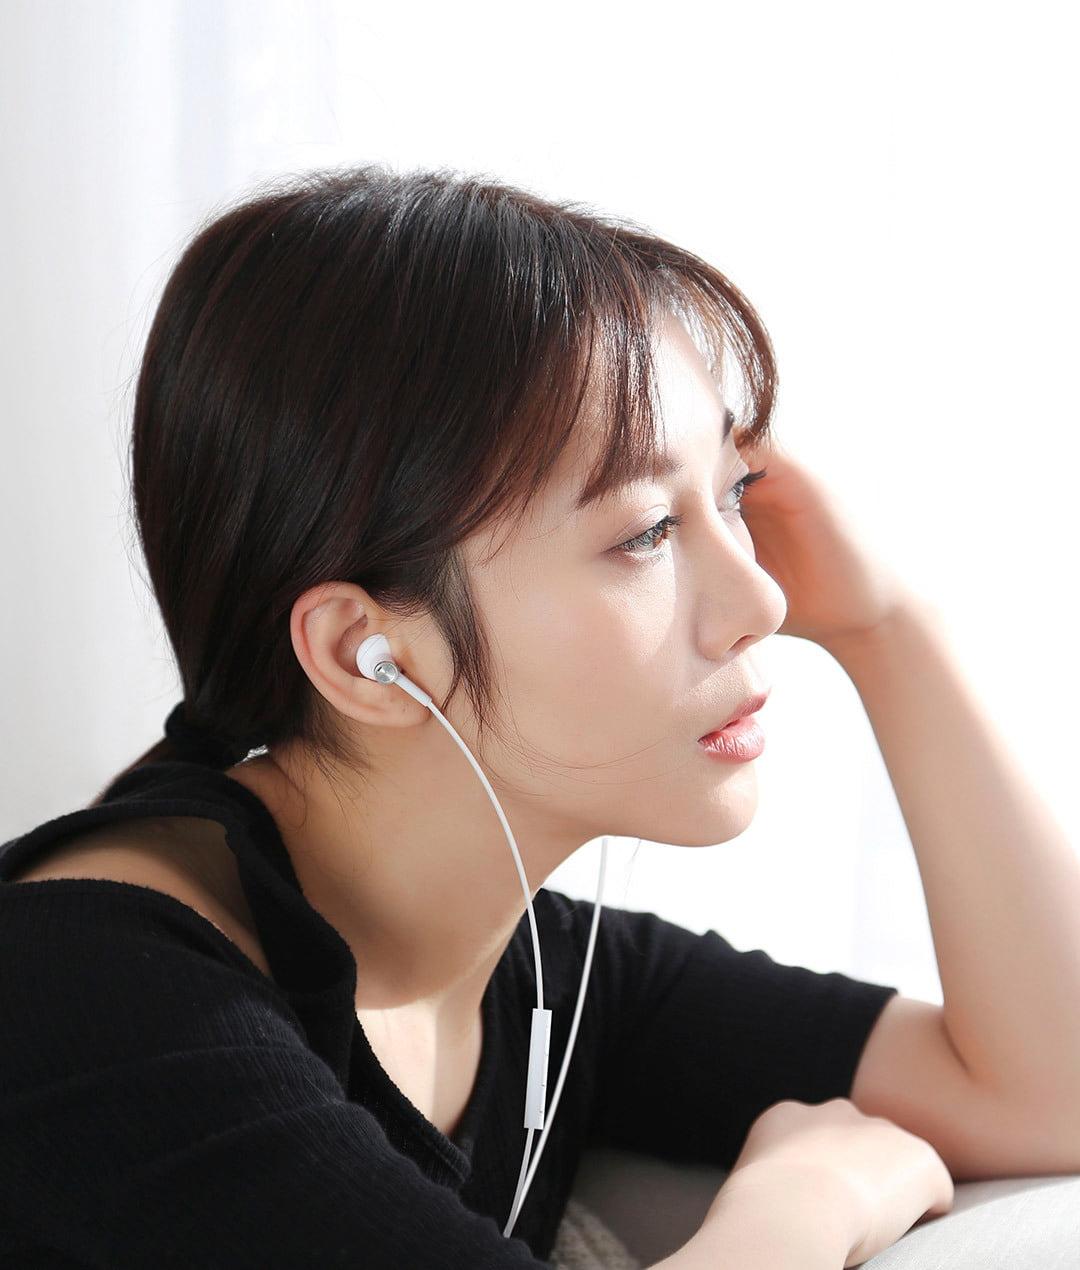 tai nghe gom xiaomi mi dual unit half ear 605c44c445229